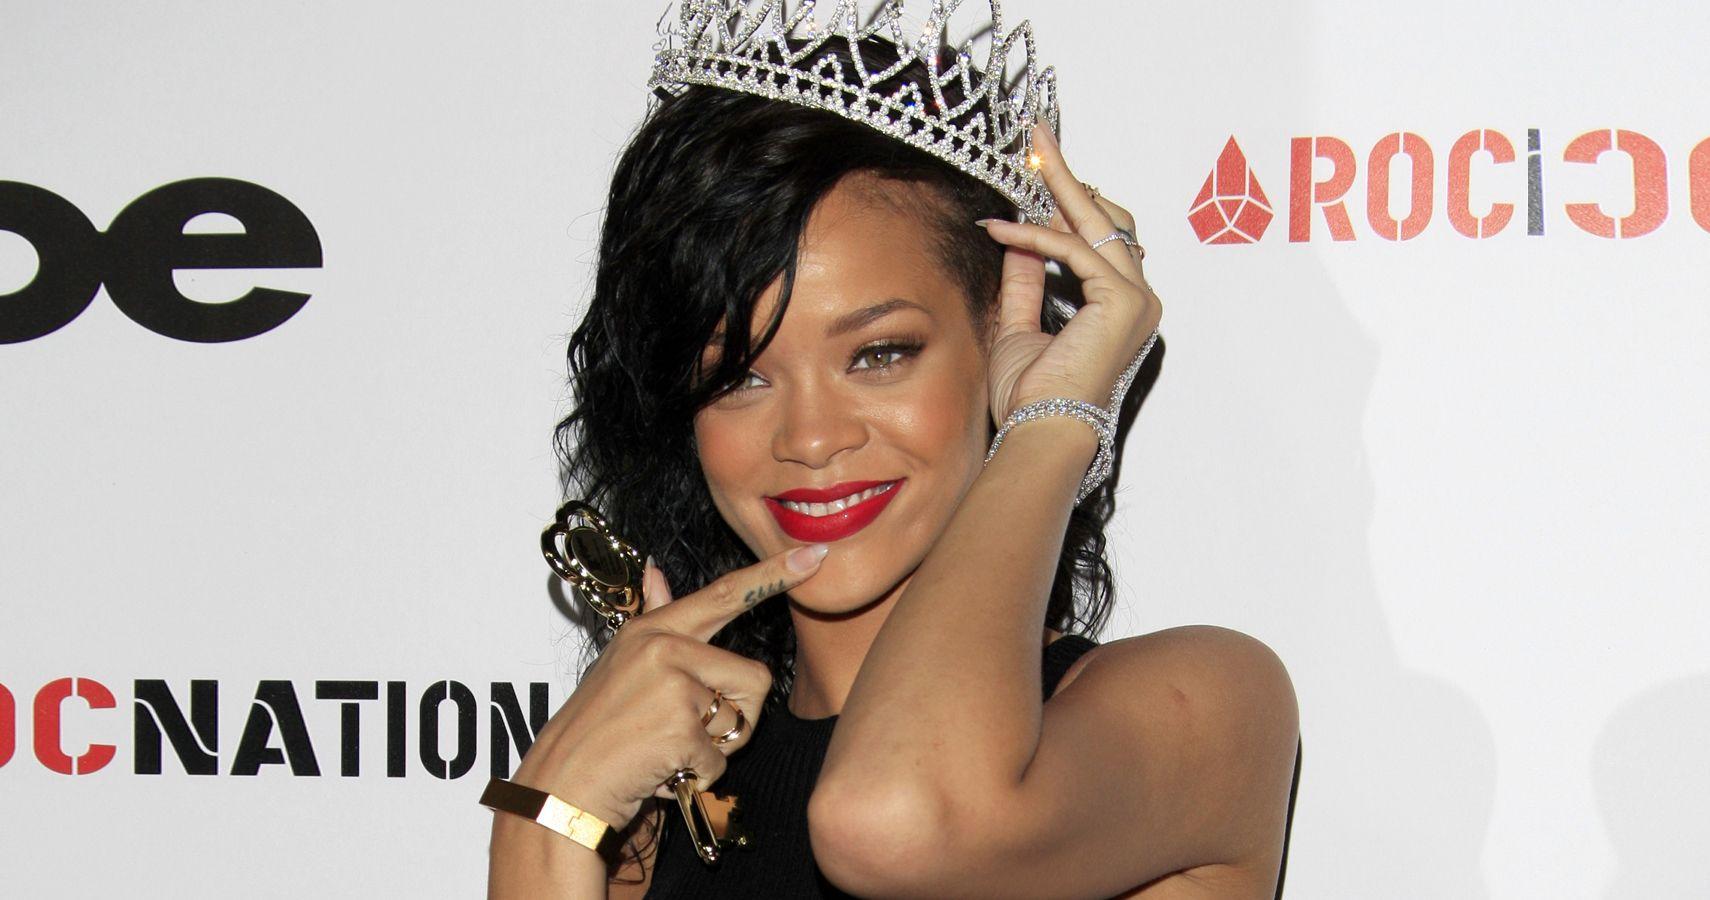 Rihanna Officially A Billionaire | TheRichest.com